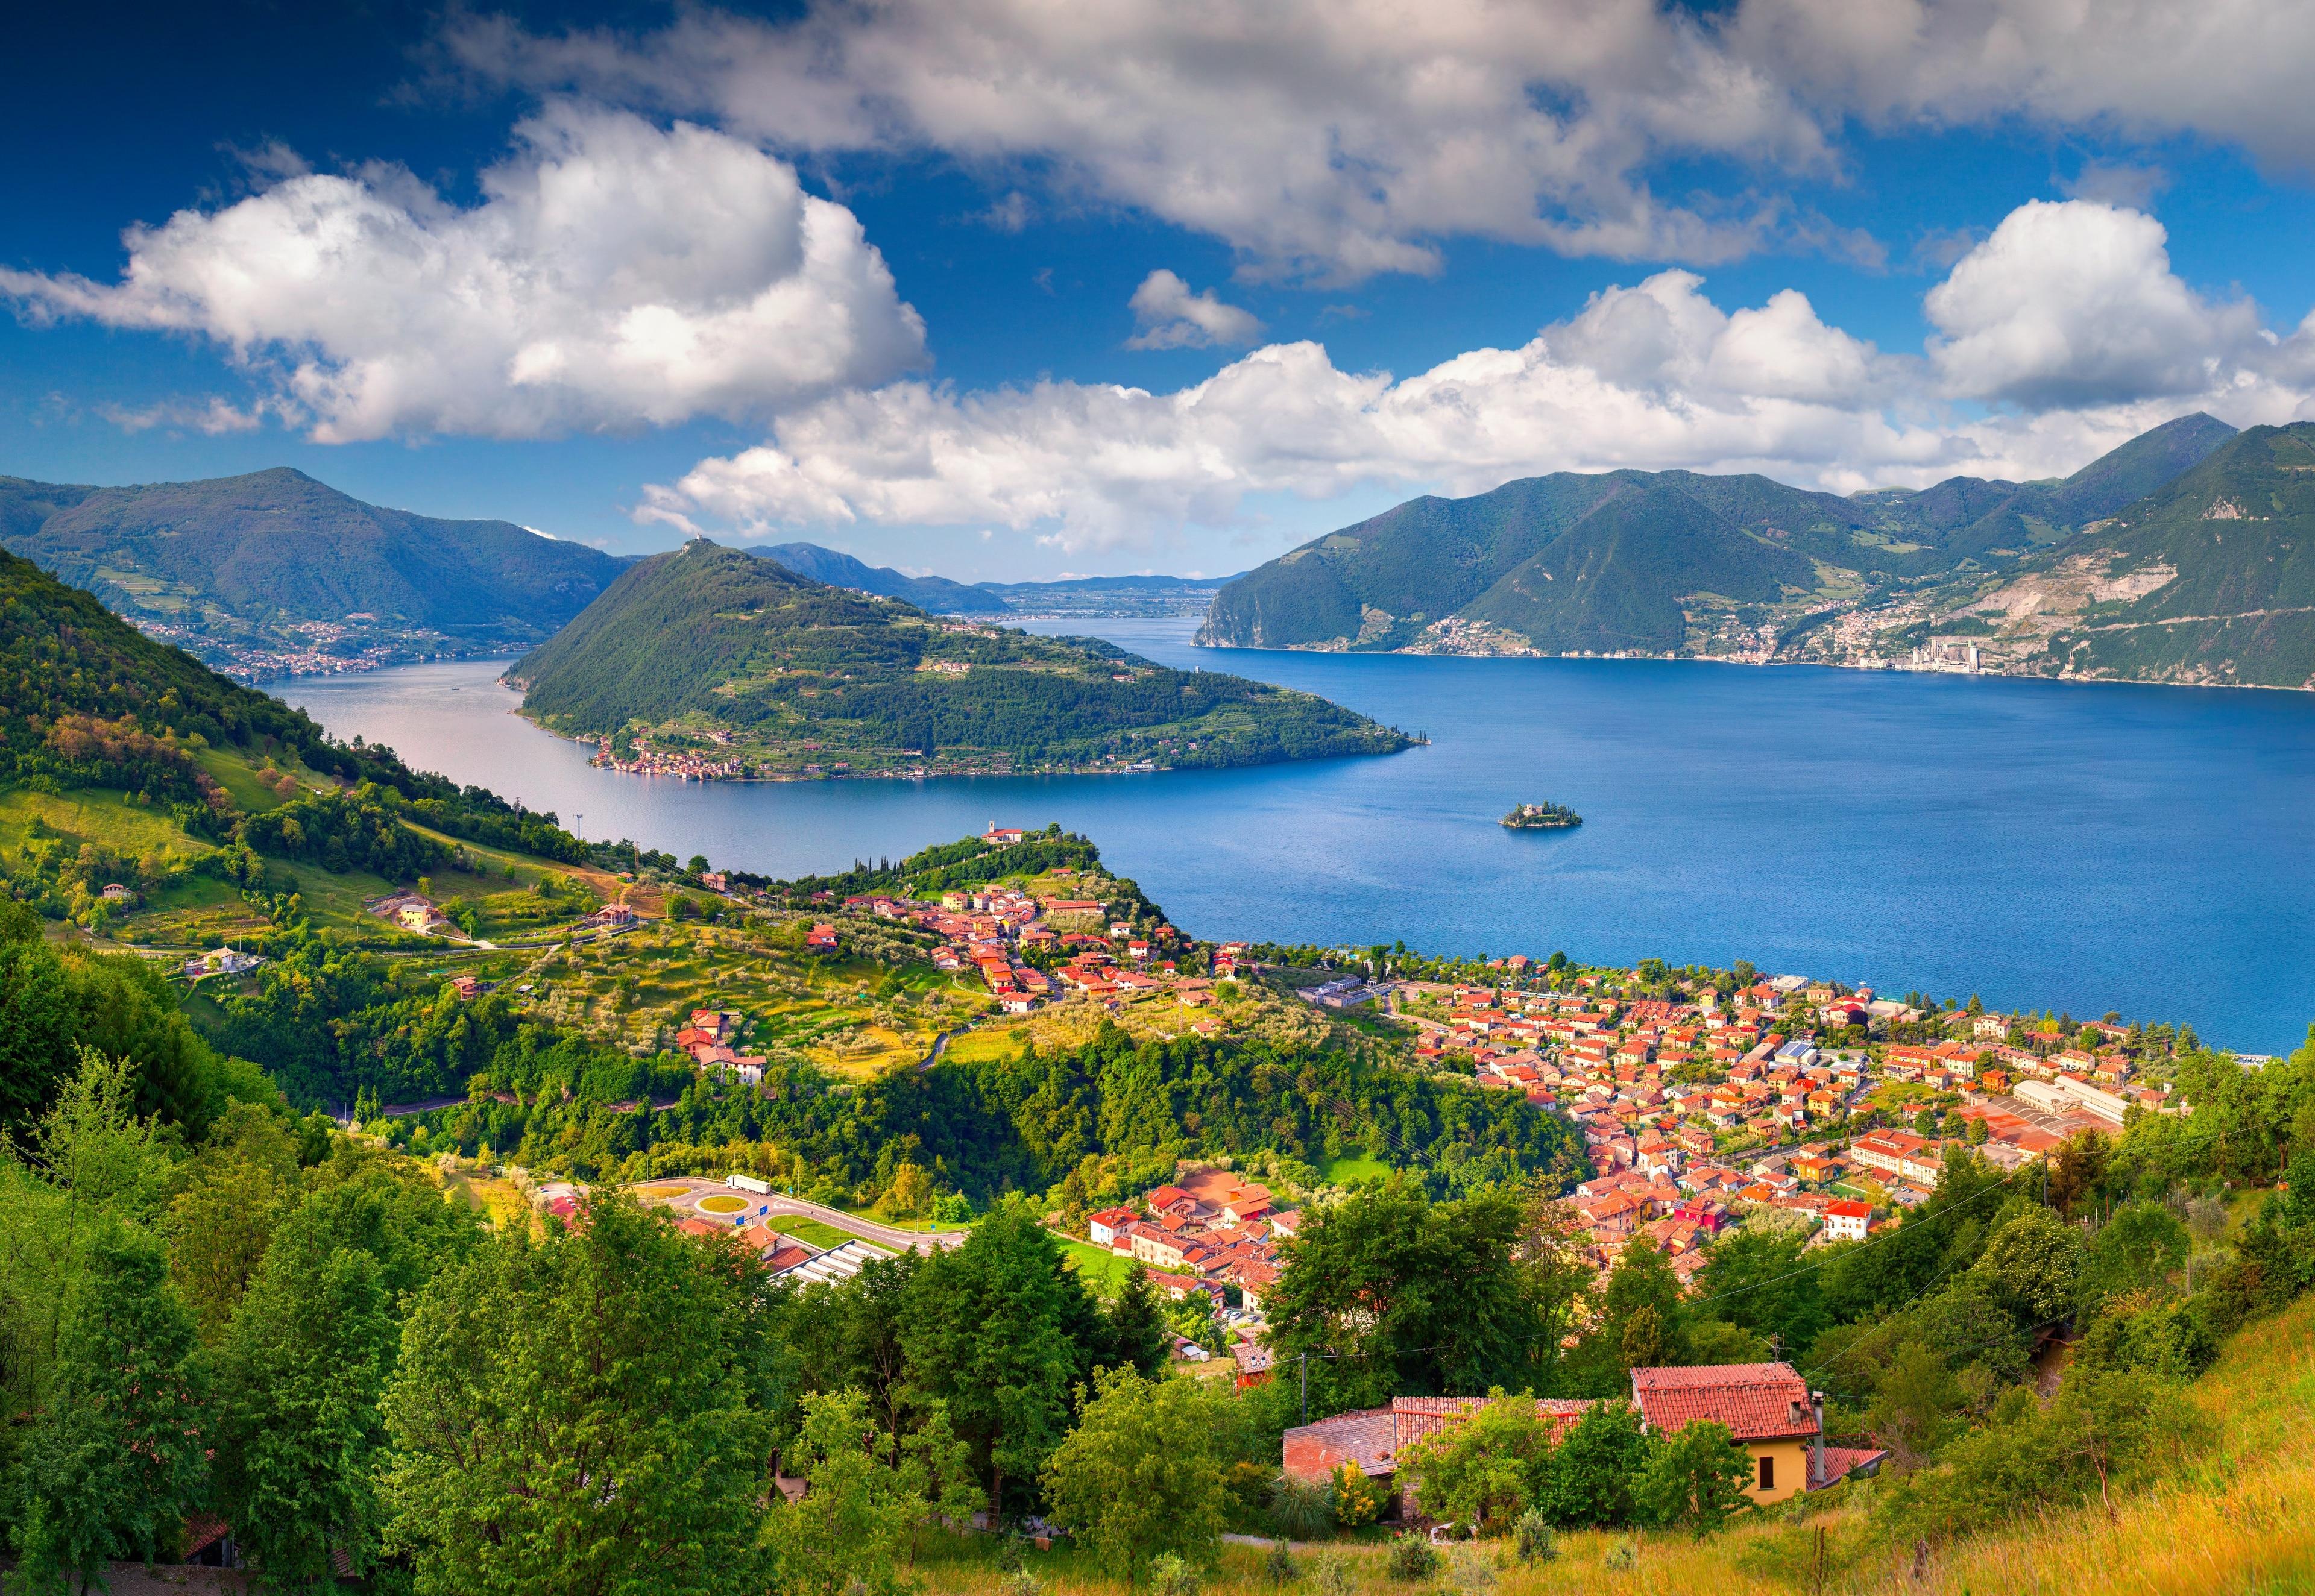 Lake Iseo, Lombardy, Italy